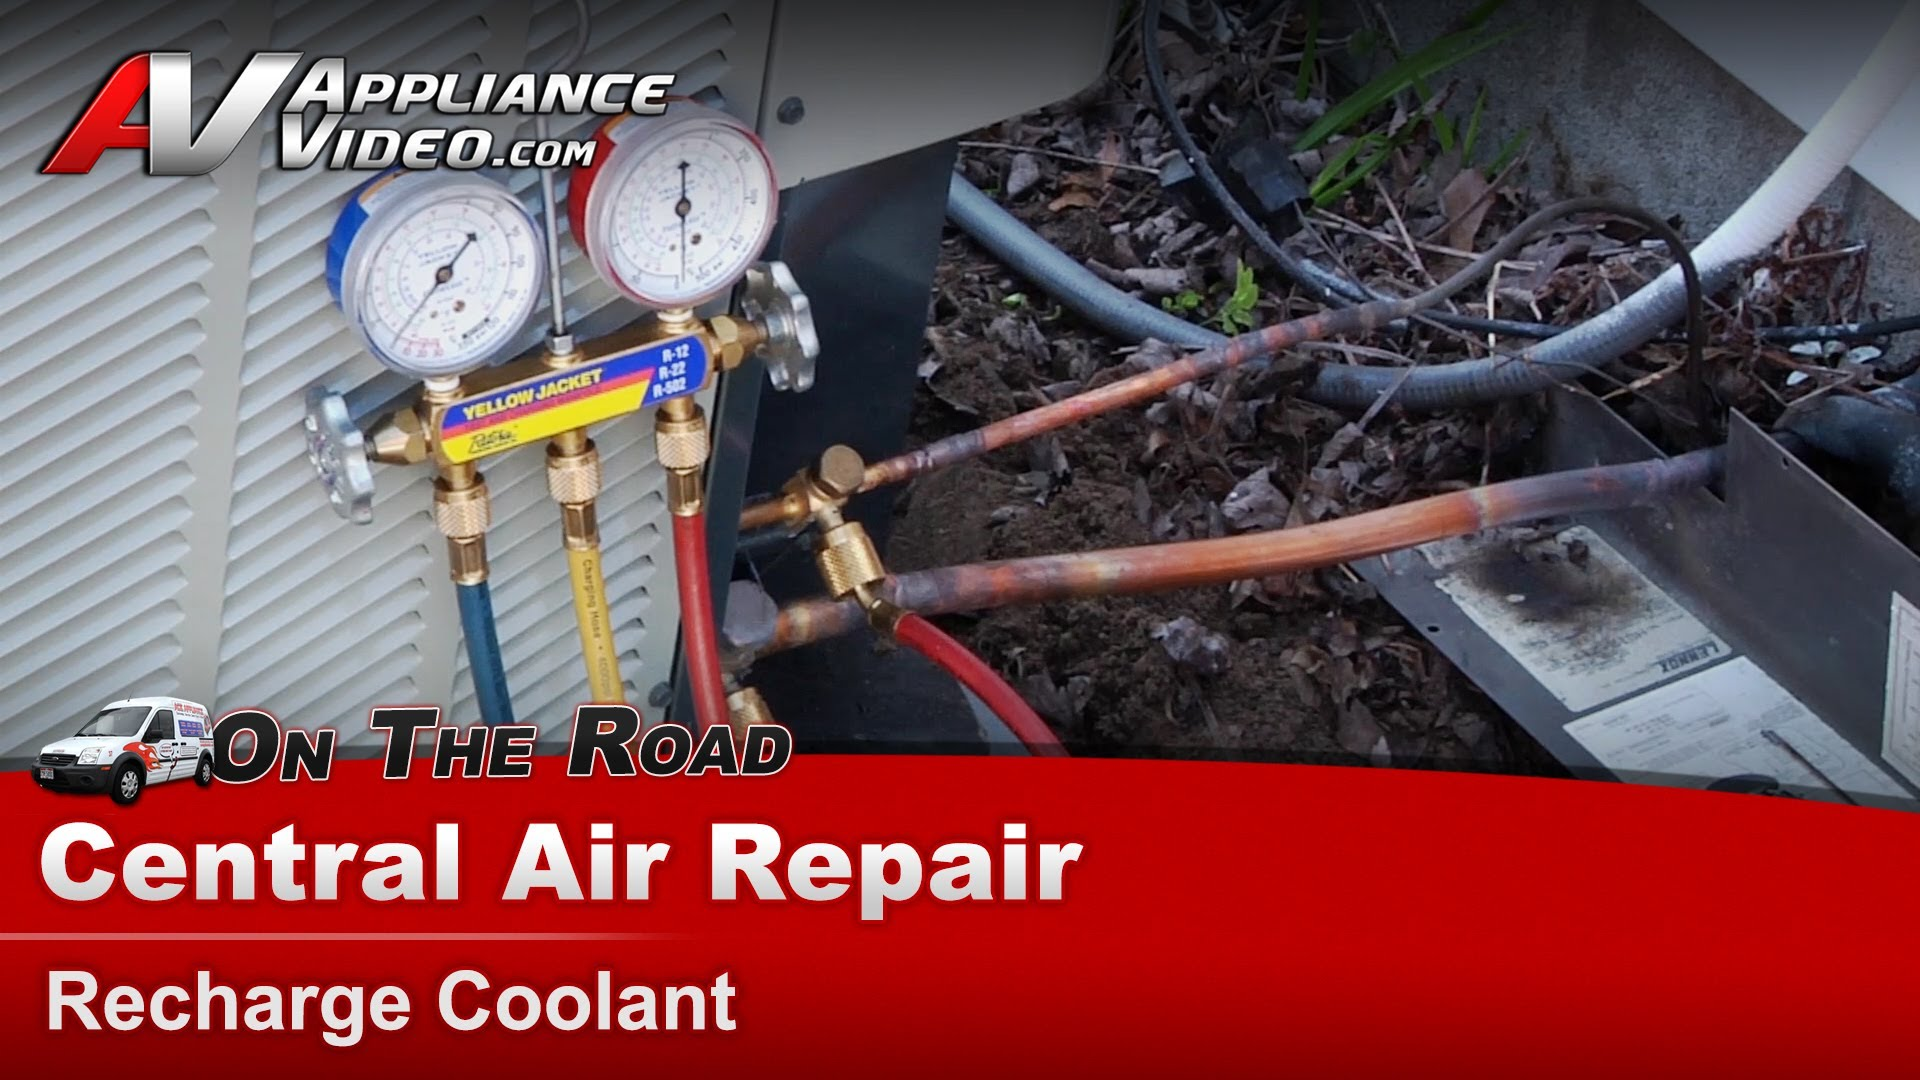 Trane Xr15 Air Conditioner Repair Recharge Coolant Appliance Video